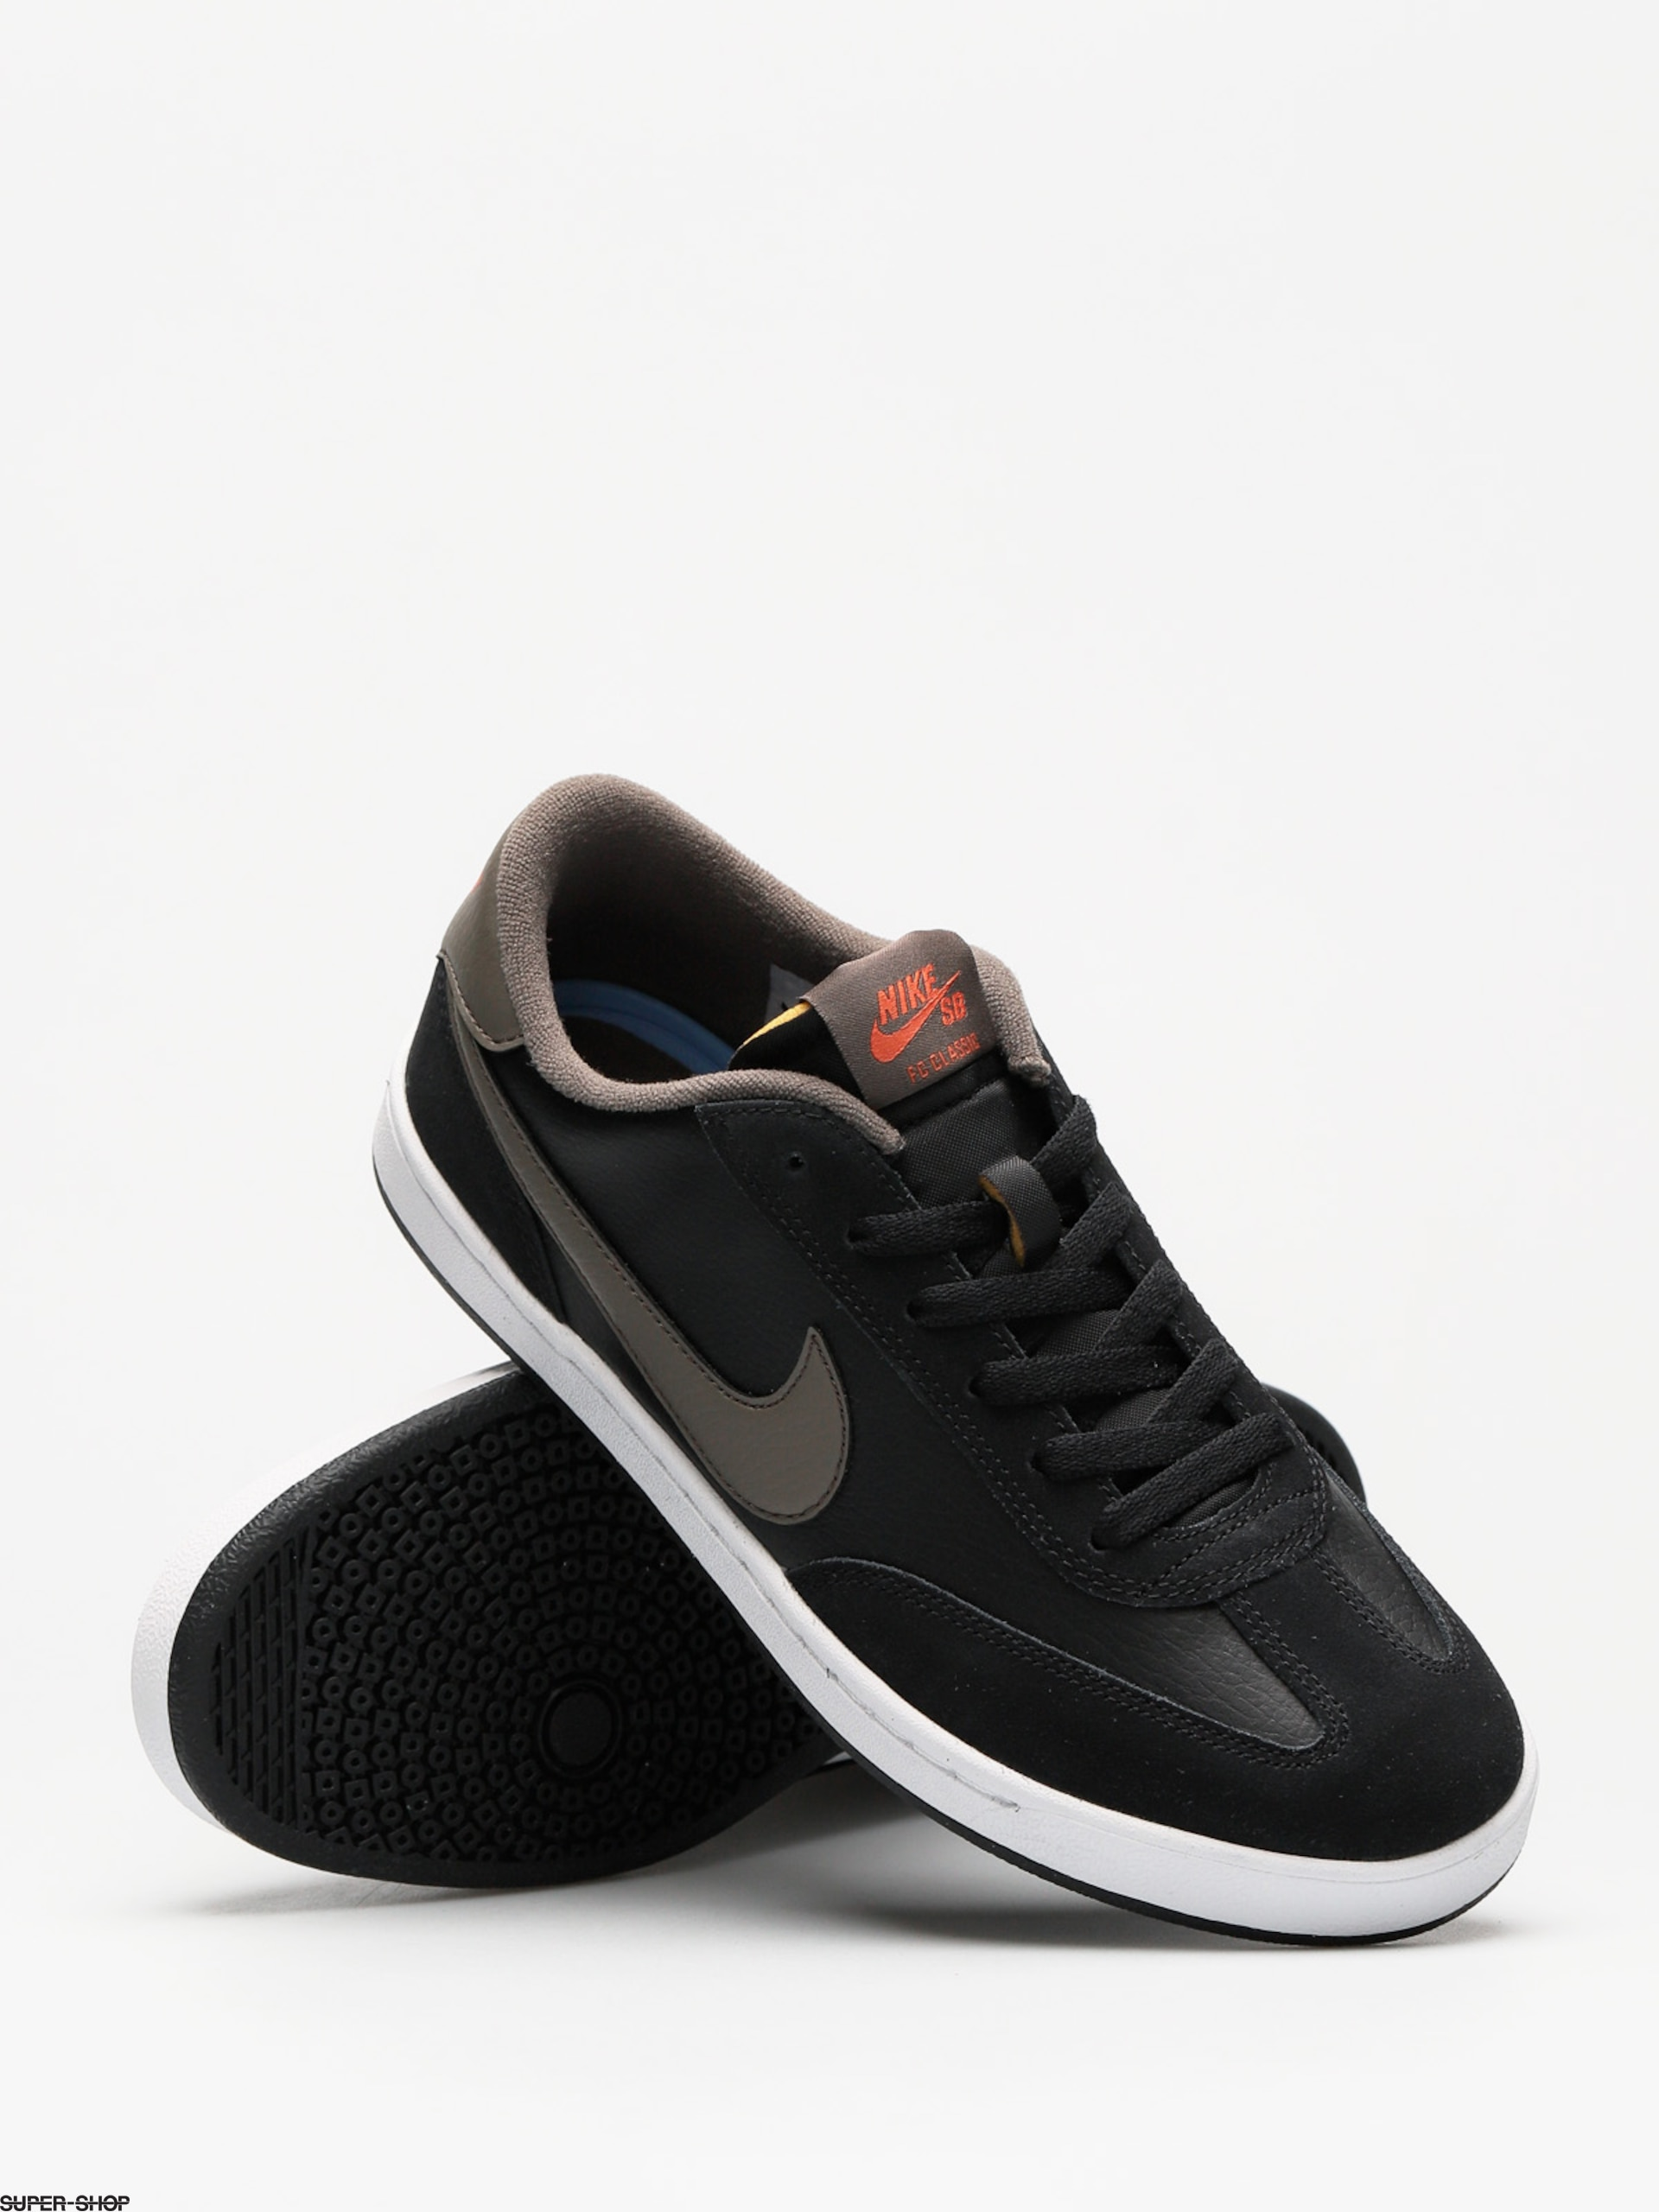 5c90655a0731 Nike SB Shoes Sb Fc Classic (black ridgerock vintage coral white)